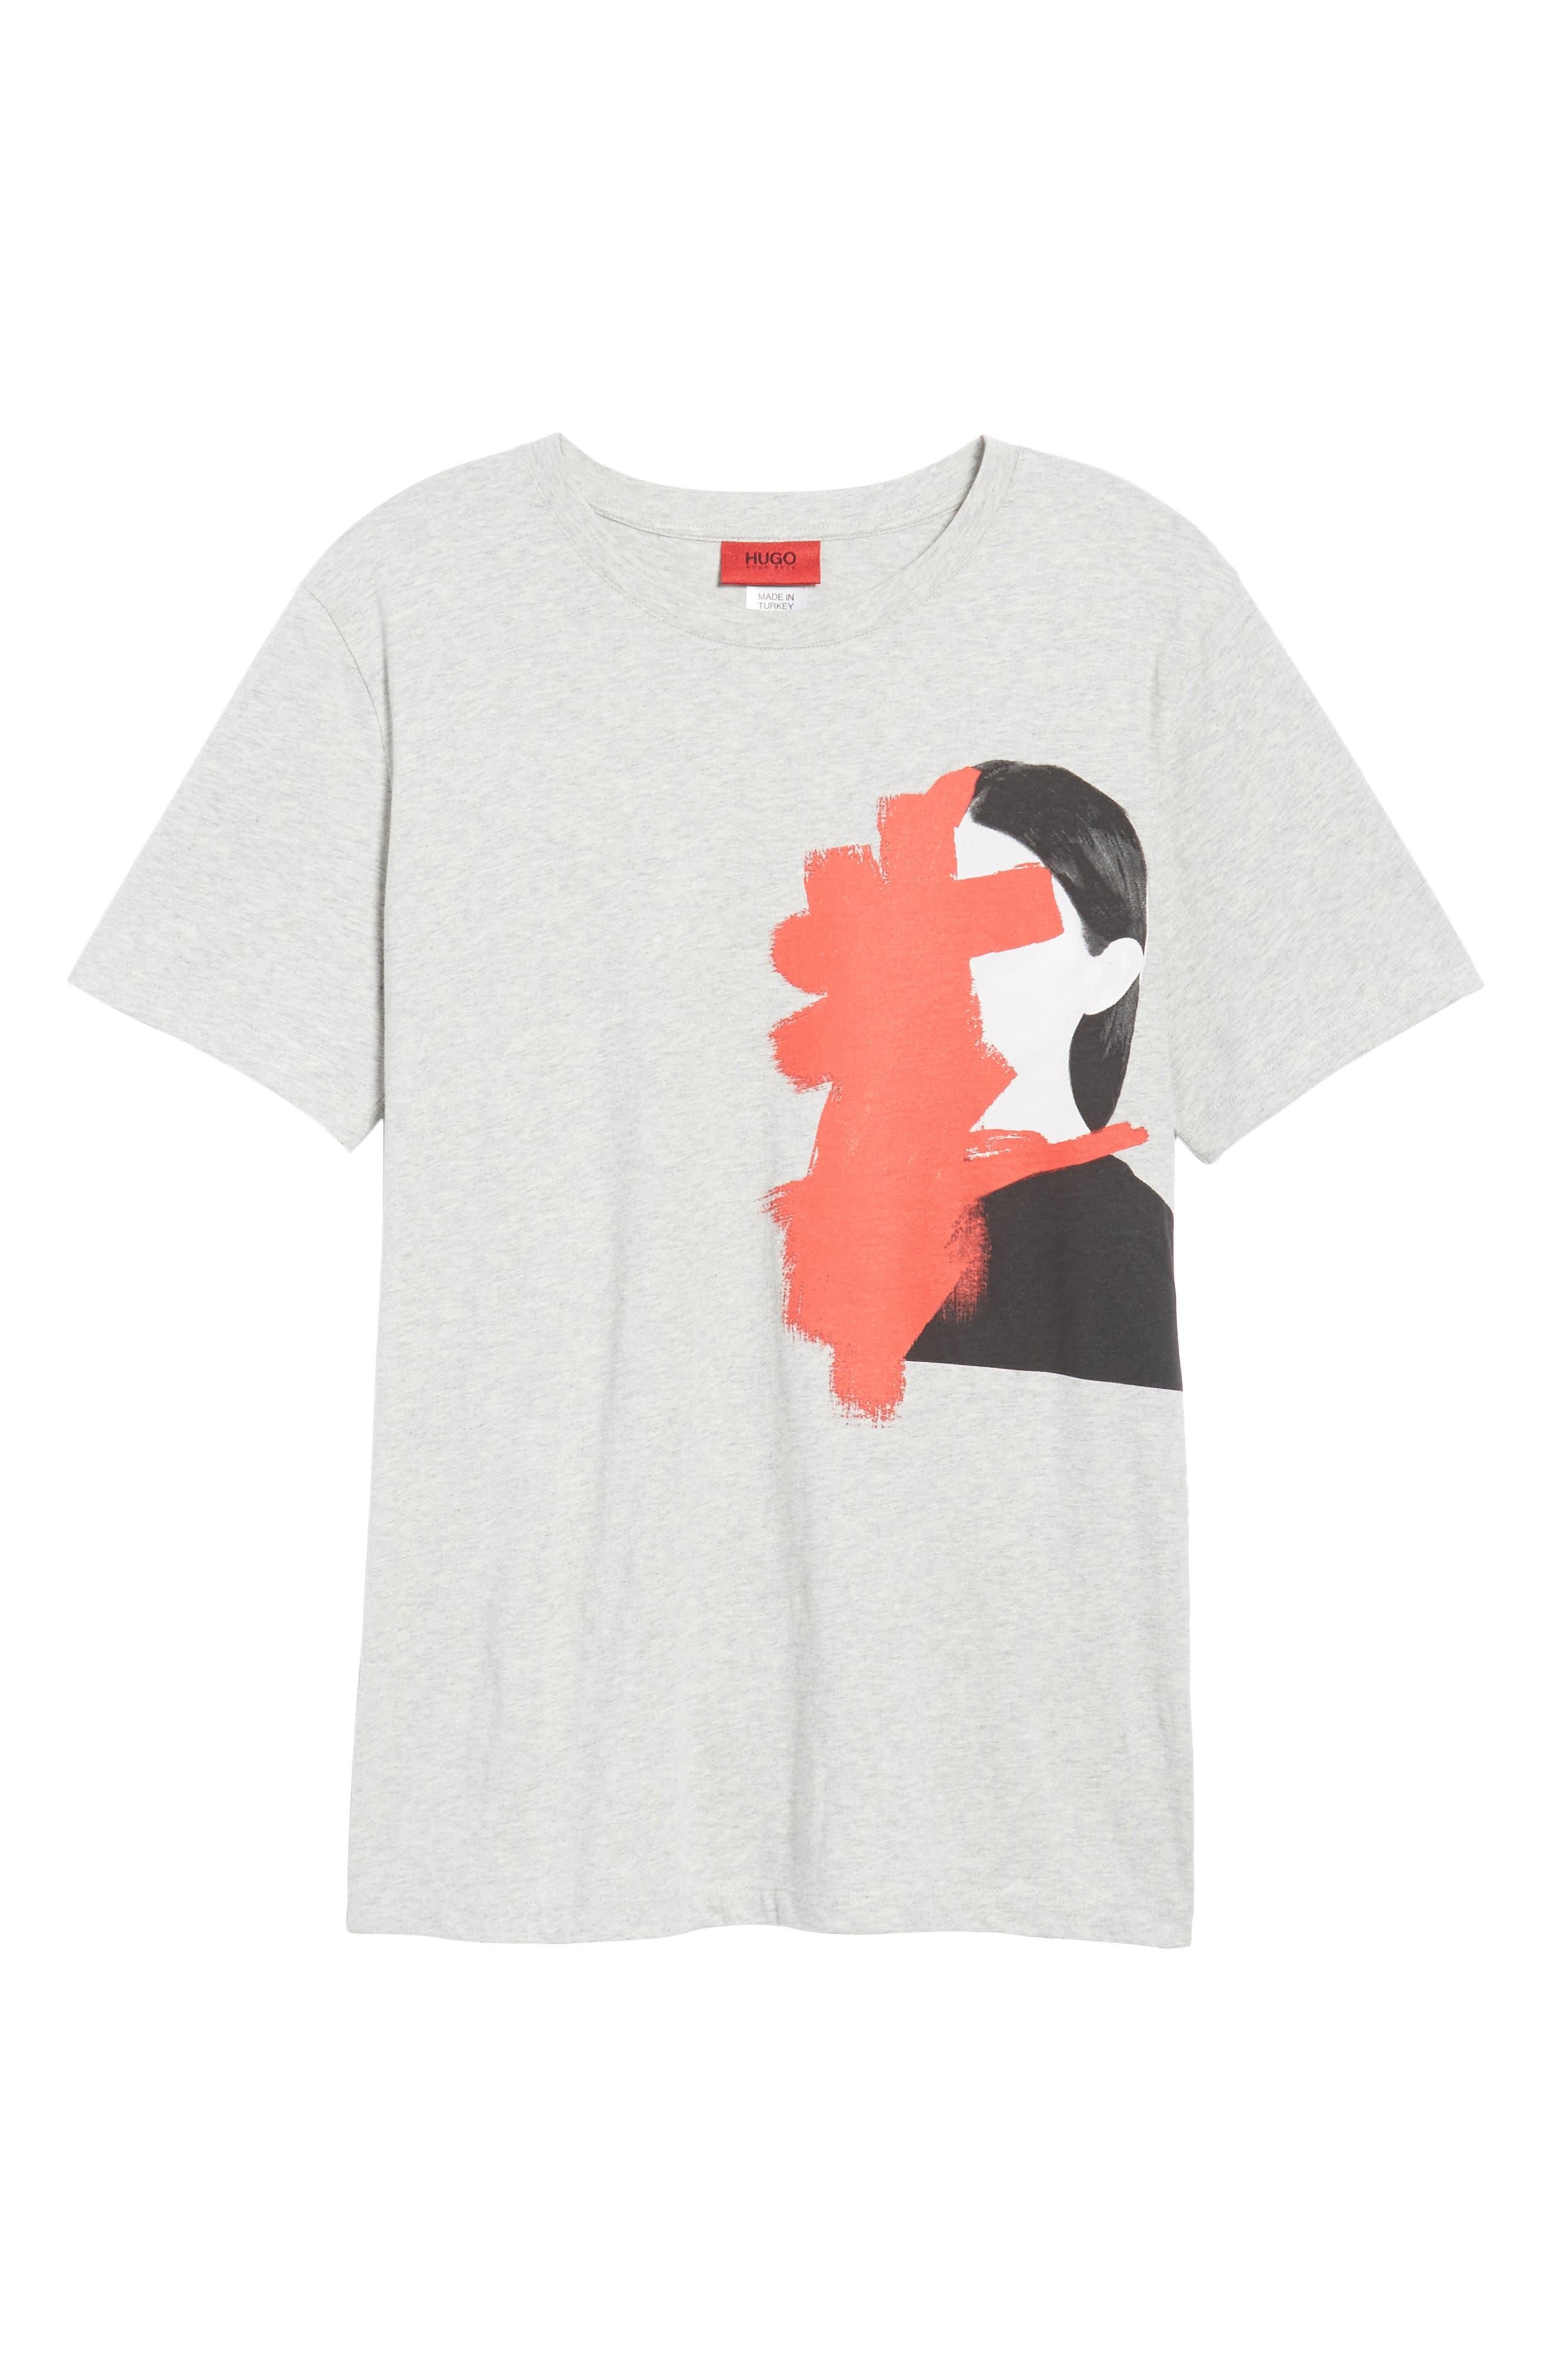 Drush Slim Fit Graphic T-Shirt,                             Alternate thumbnail 6, color,                             Grey